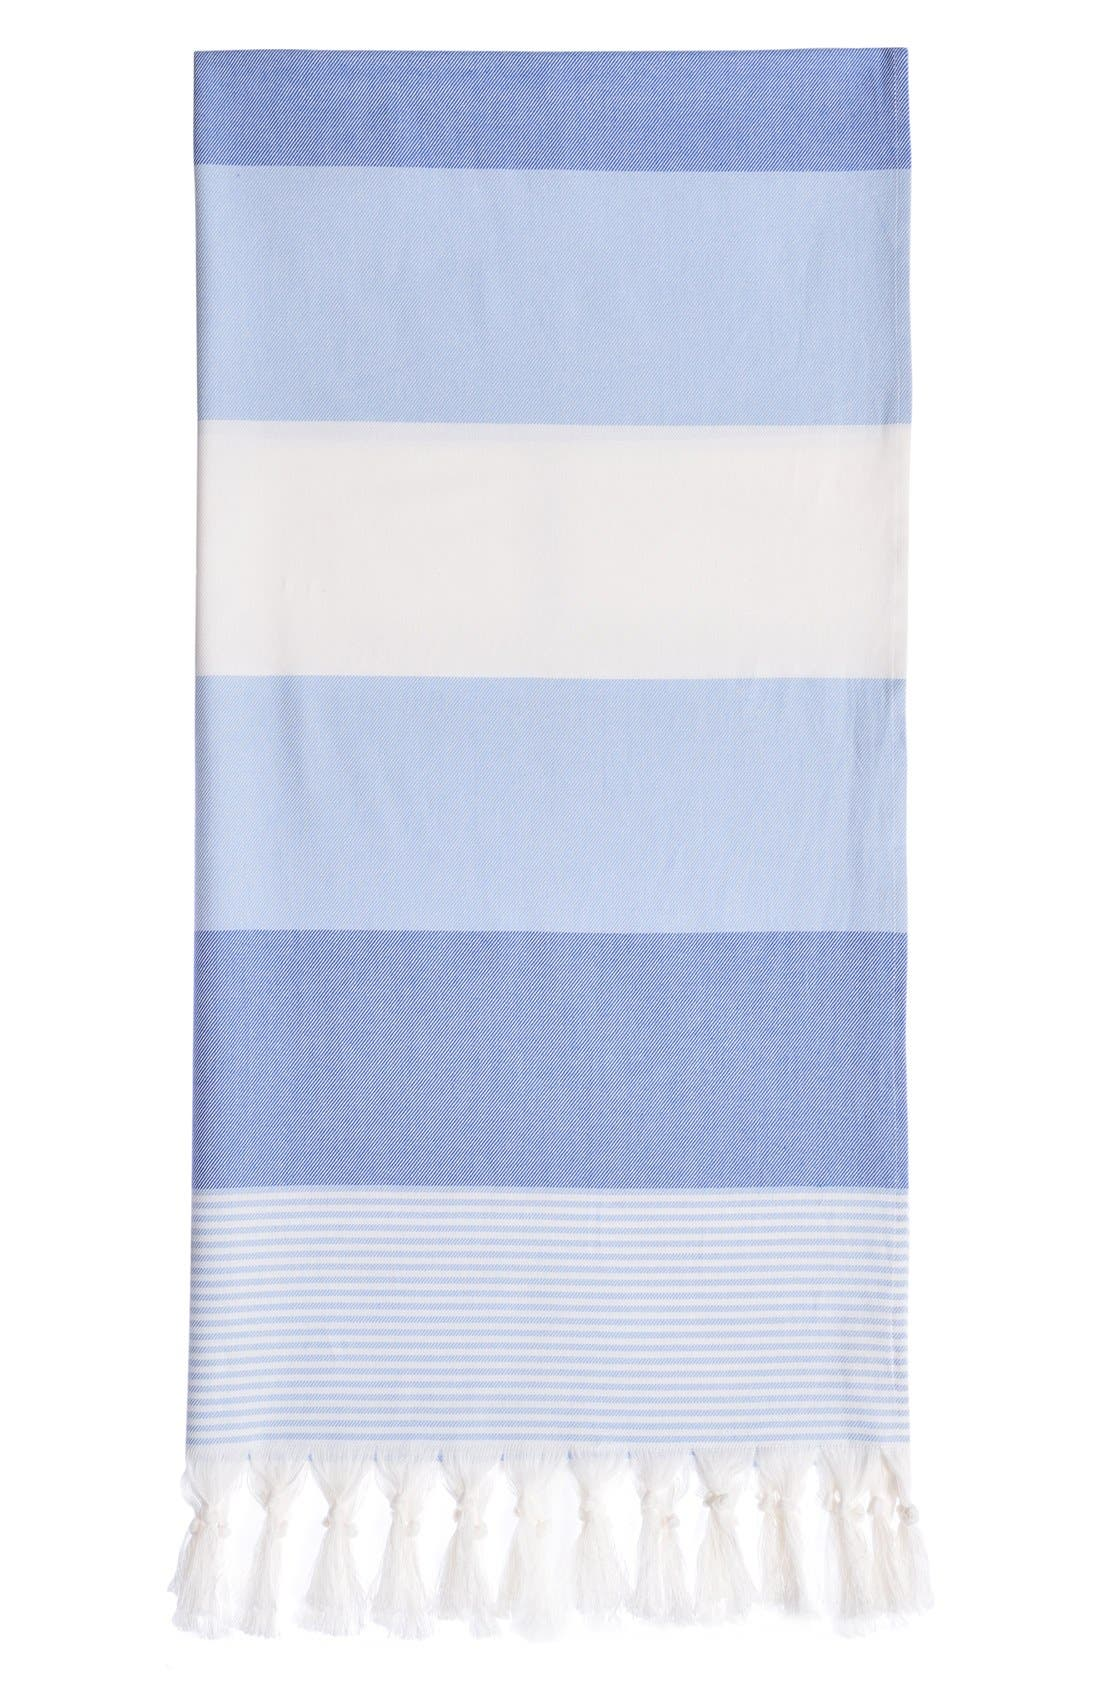 'Sea Waves' Turkish Pestemal Towel,                         Main,                         color, 400